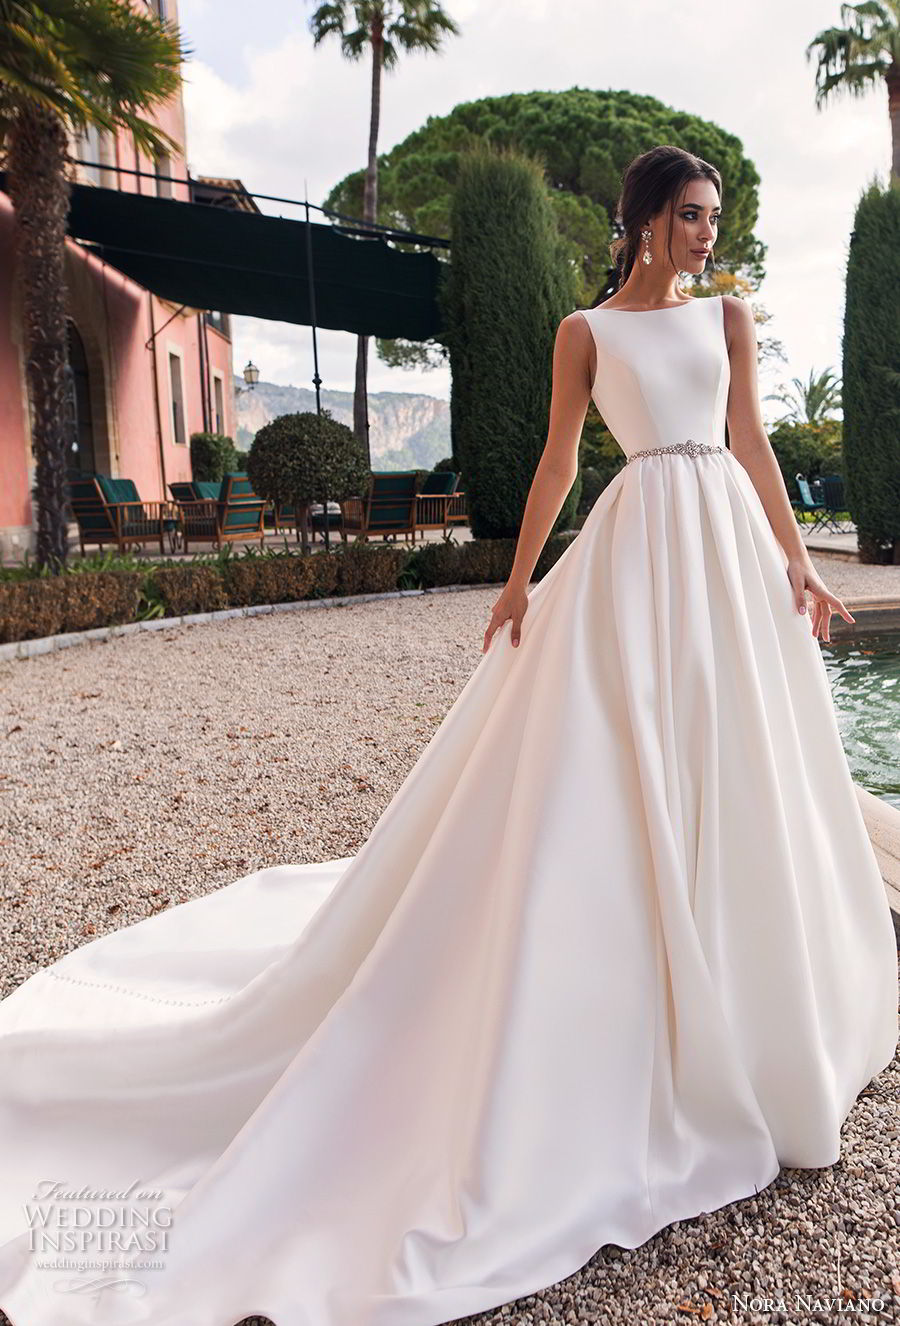 nora naviano 2019 bridal sleeveless bateau neckline simple clean minimalist elegant a line wedding dress open scoop back royal train (16) mv